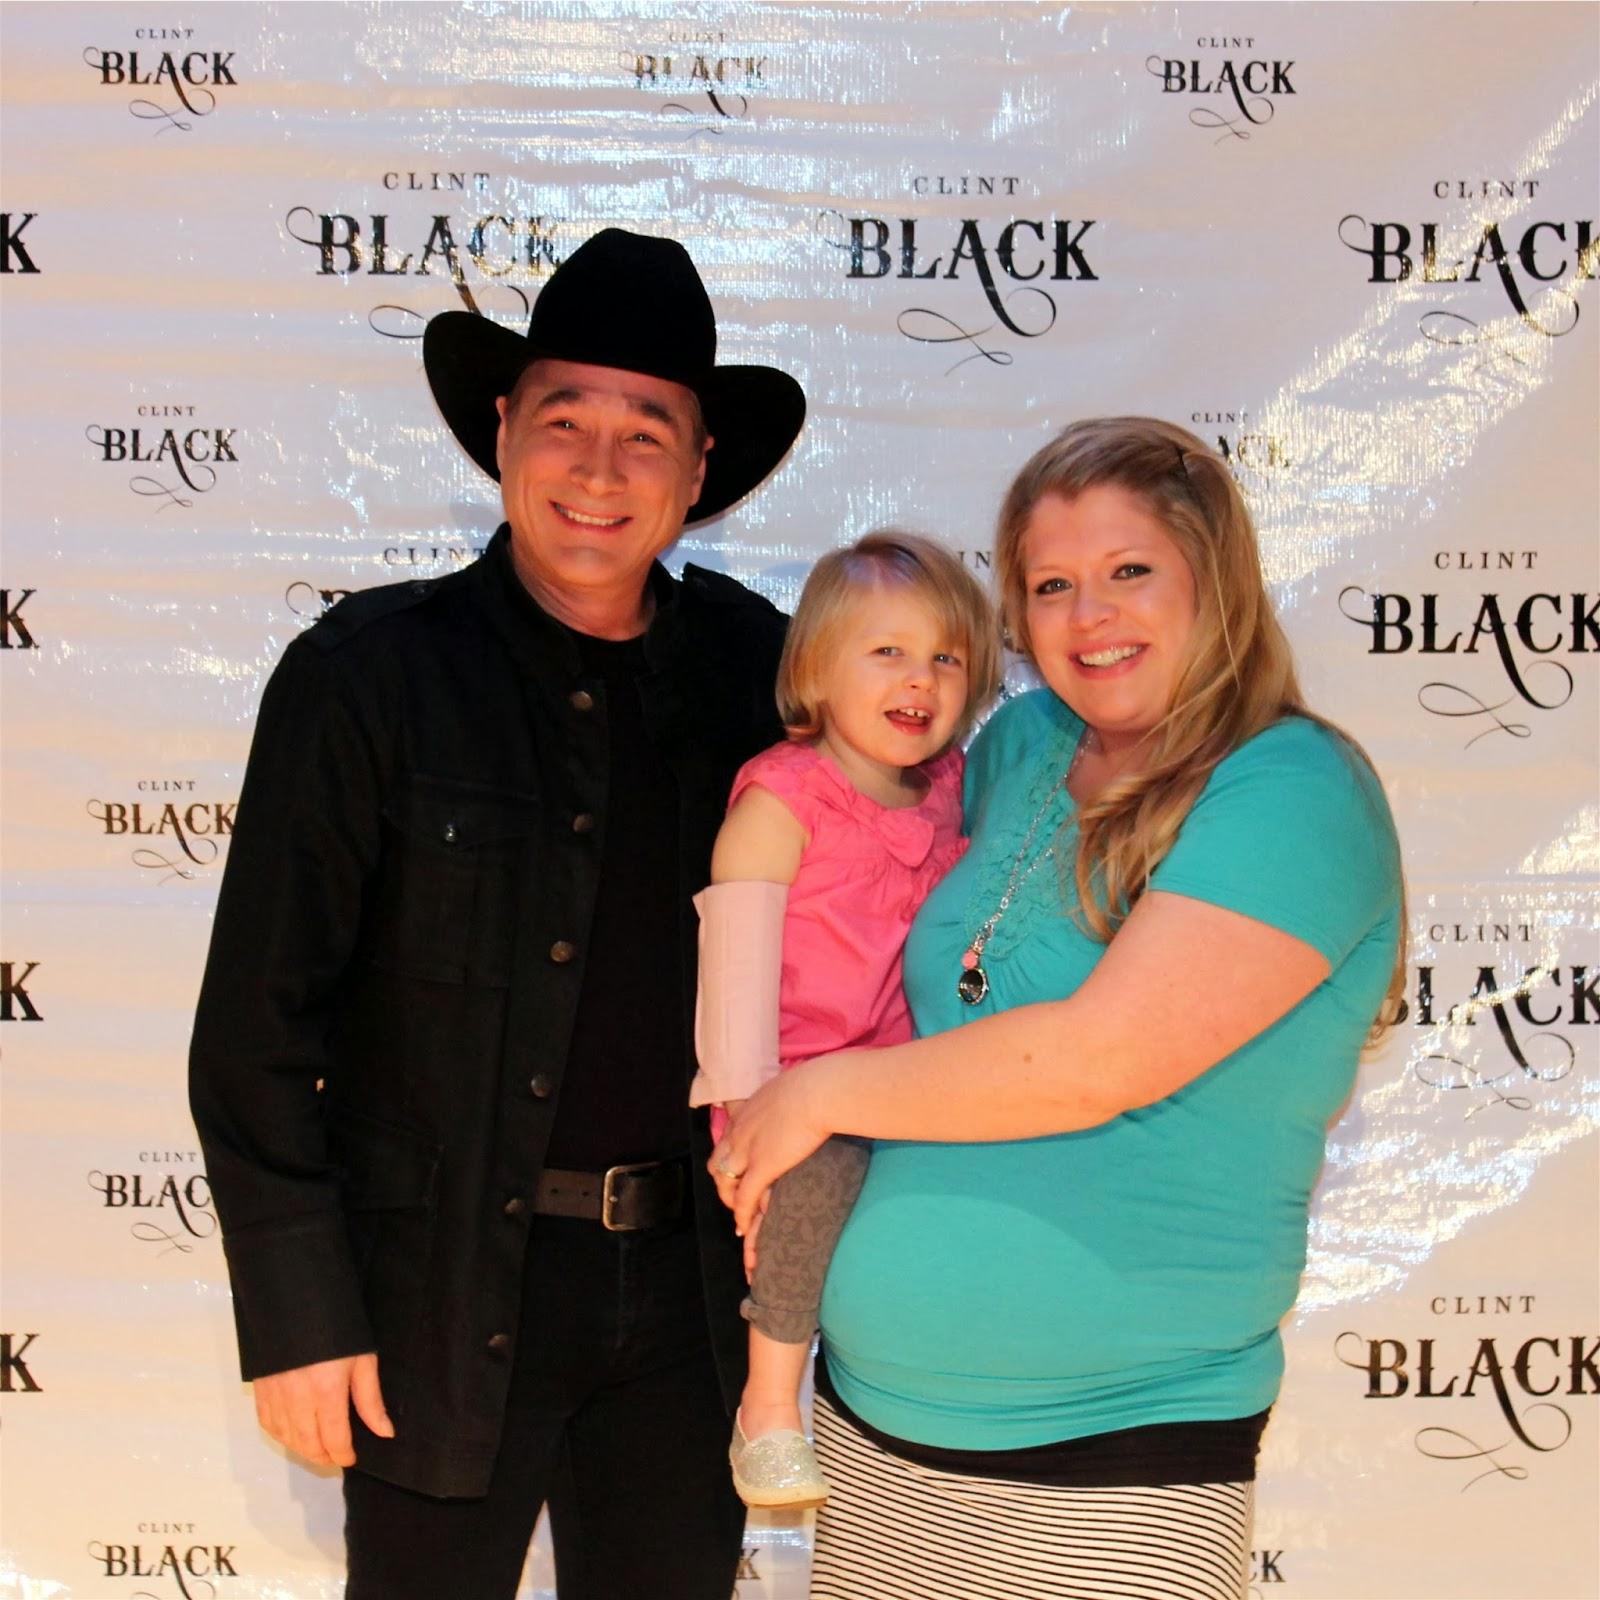 Clint Black Daughter Chelsea Bain